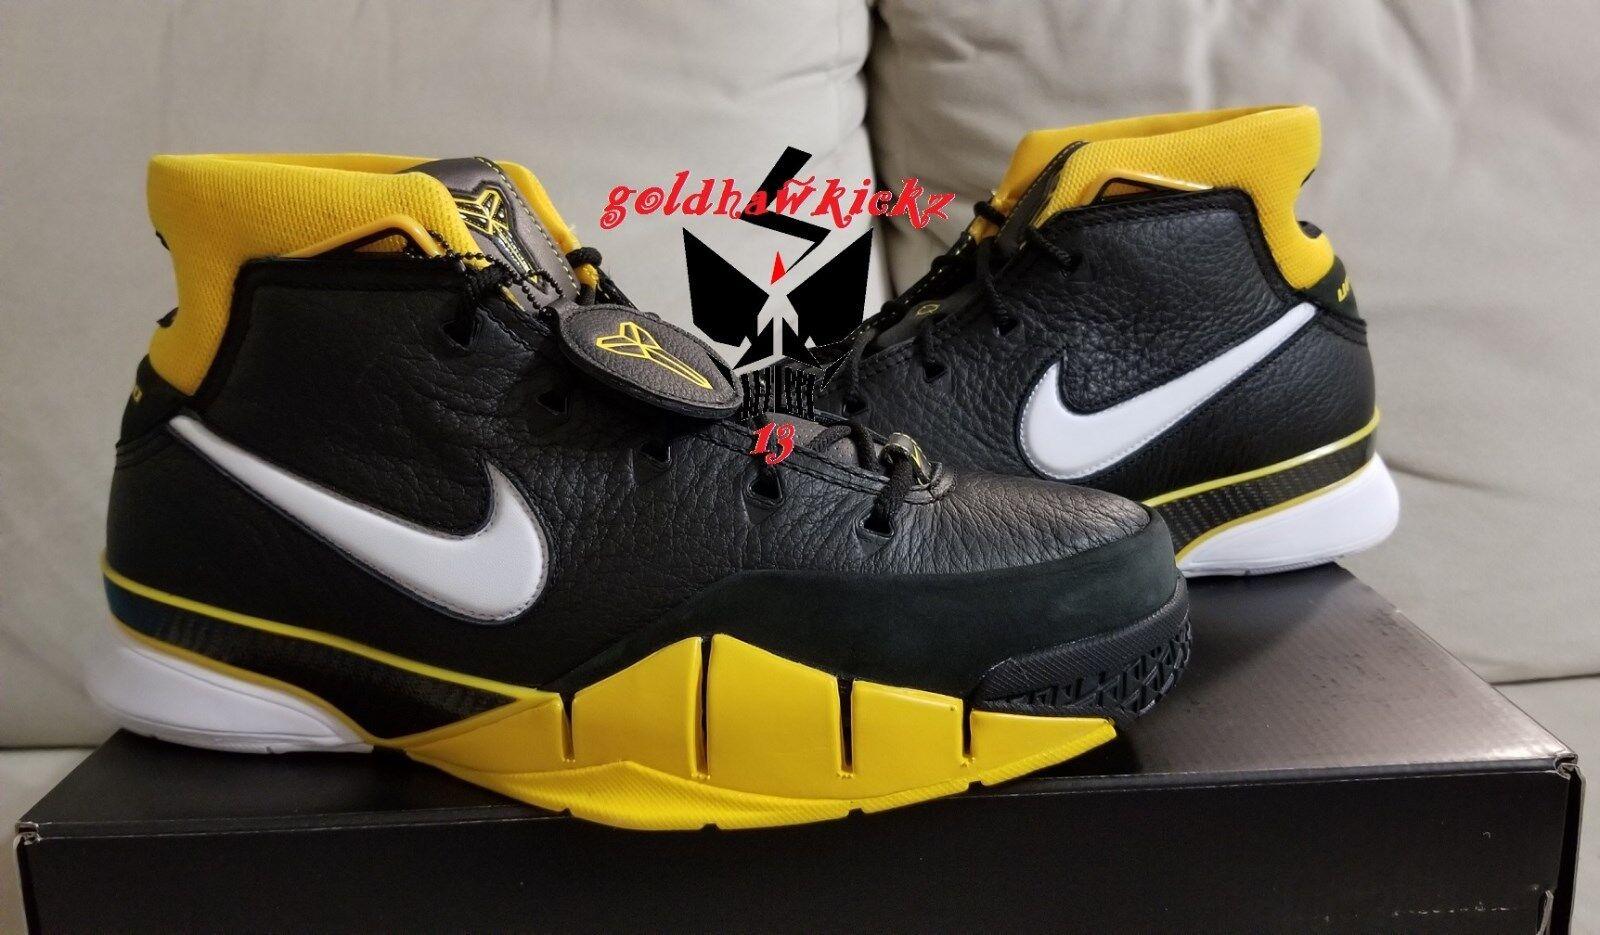 2018 Nike Zoom Kobe 1 protro protro 1 aq2728 003 del sol Varsity maíz negro 81 Mamba modelo mas vendido de la marca 5cfce9